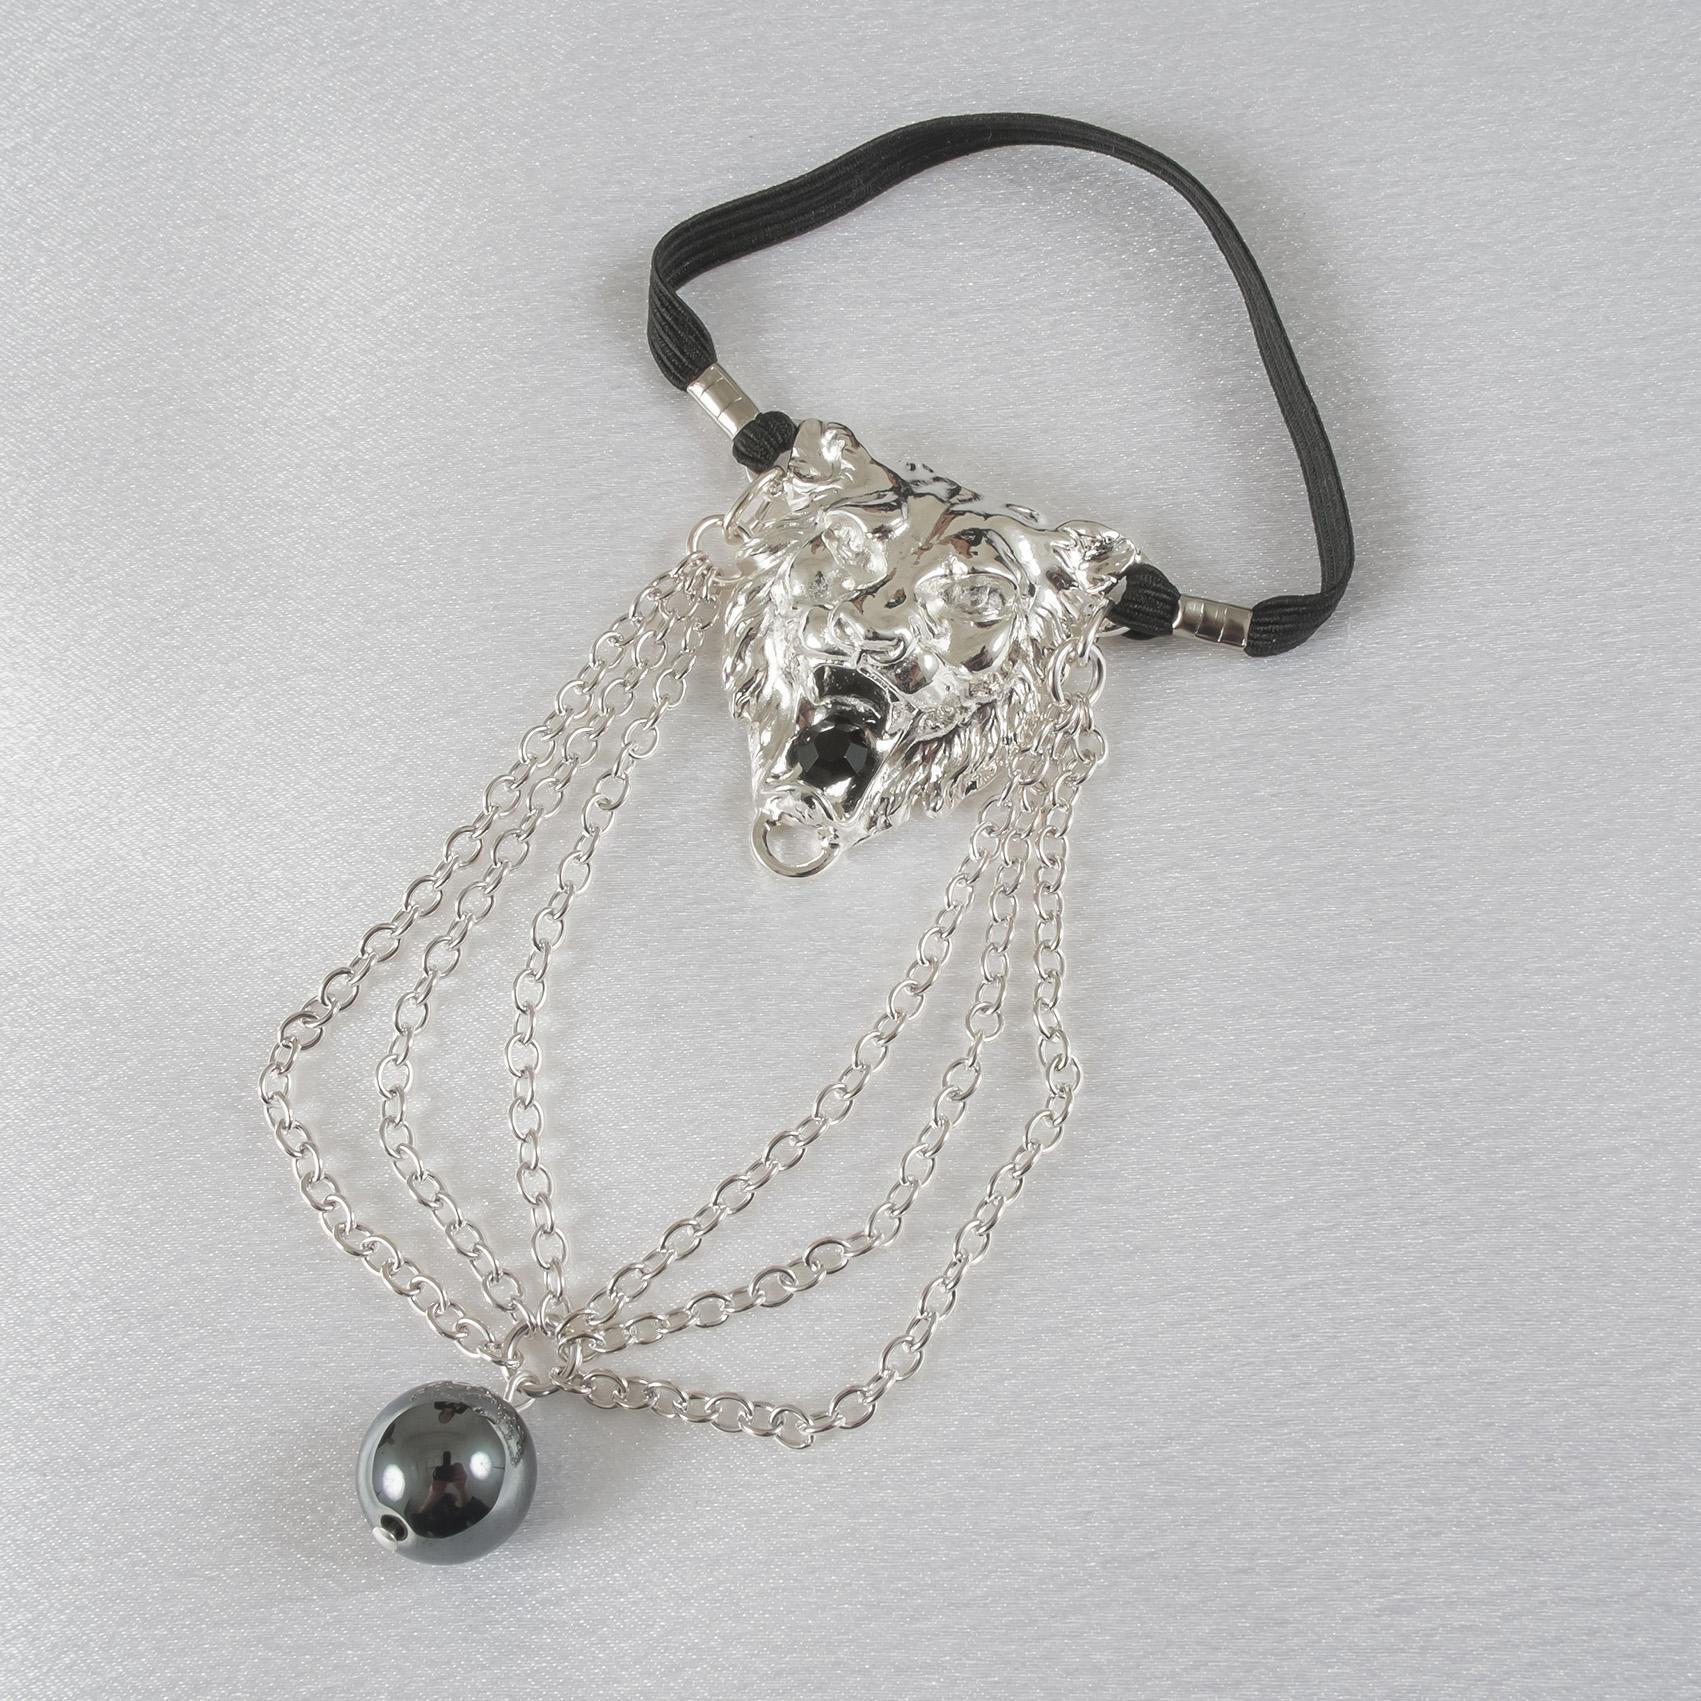 BH145 Men's Silver Lion Head Penis Chain Bracelet with Hematite Gem